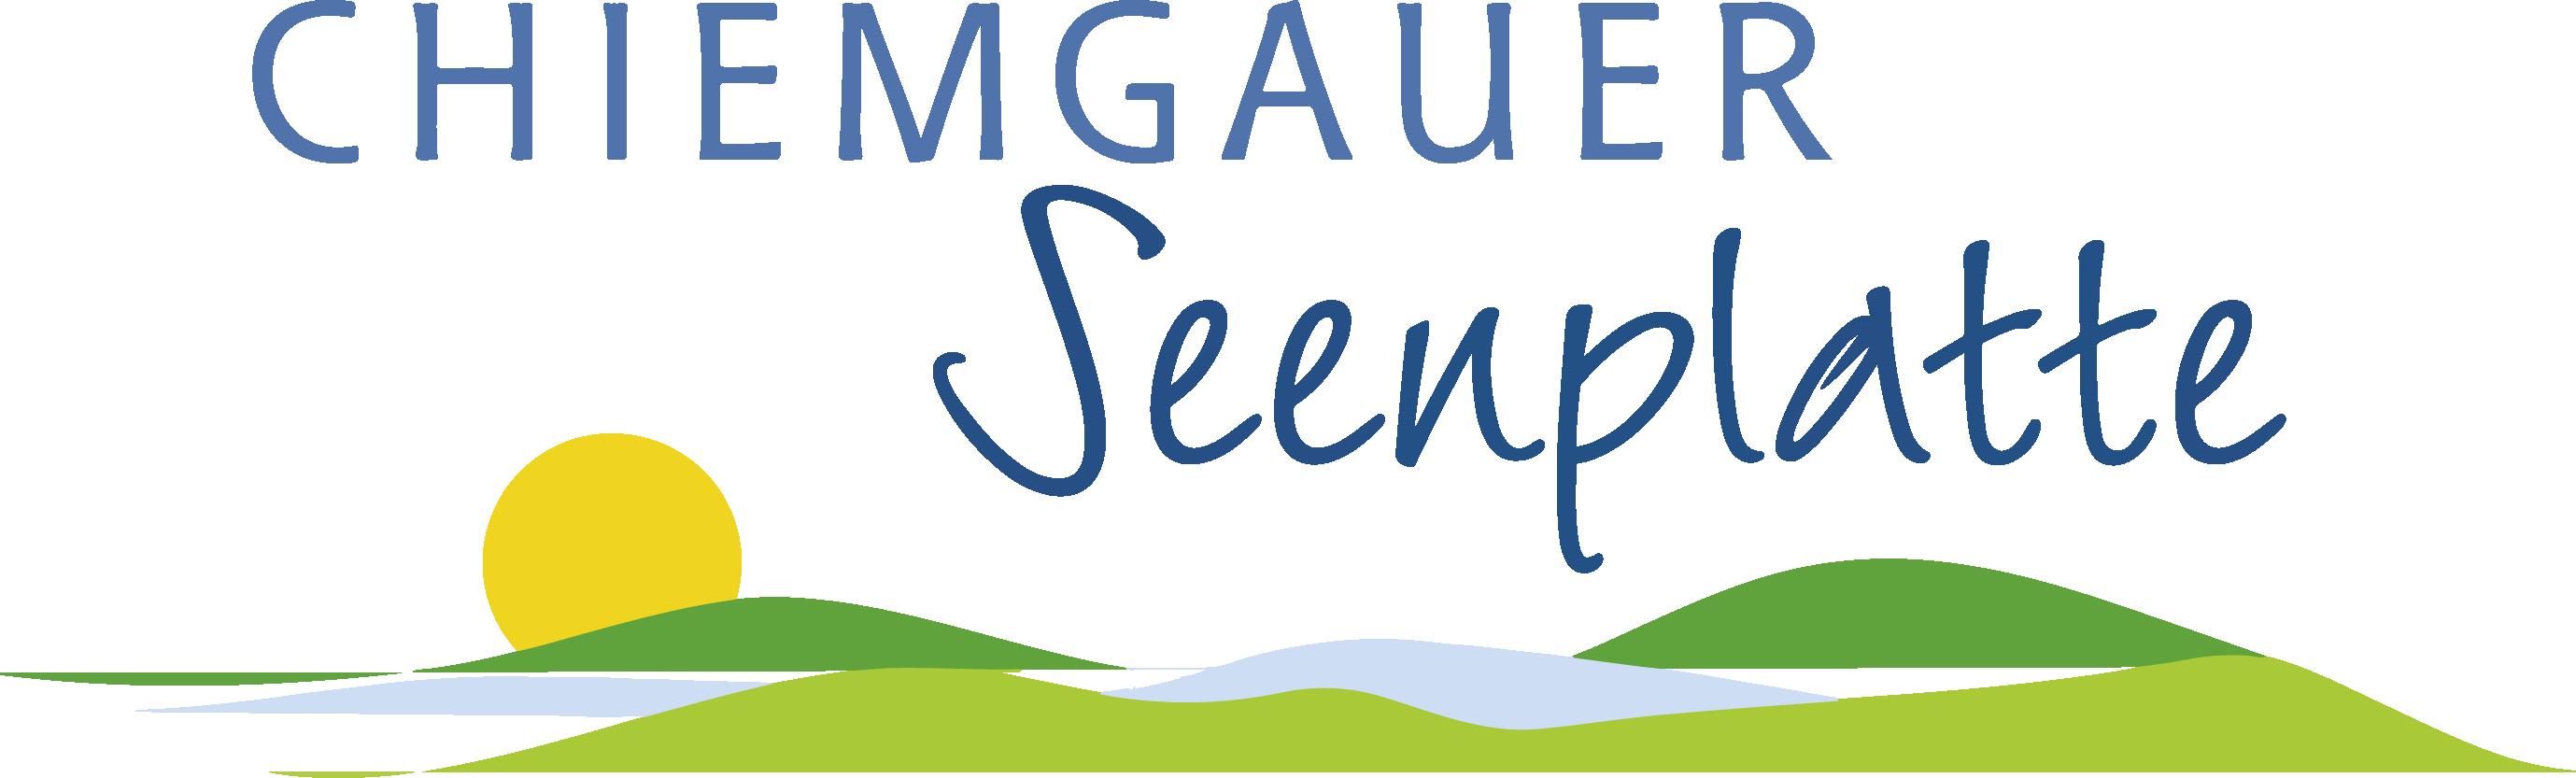 Regionalinitiative Chiemgauer-Seenplatte e.V.